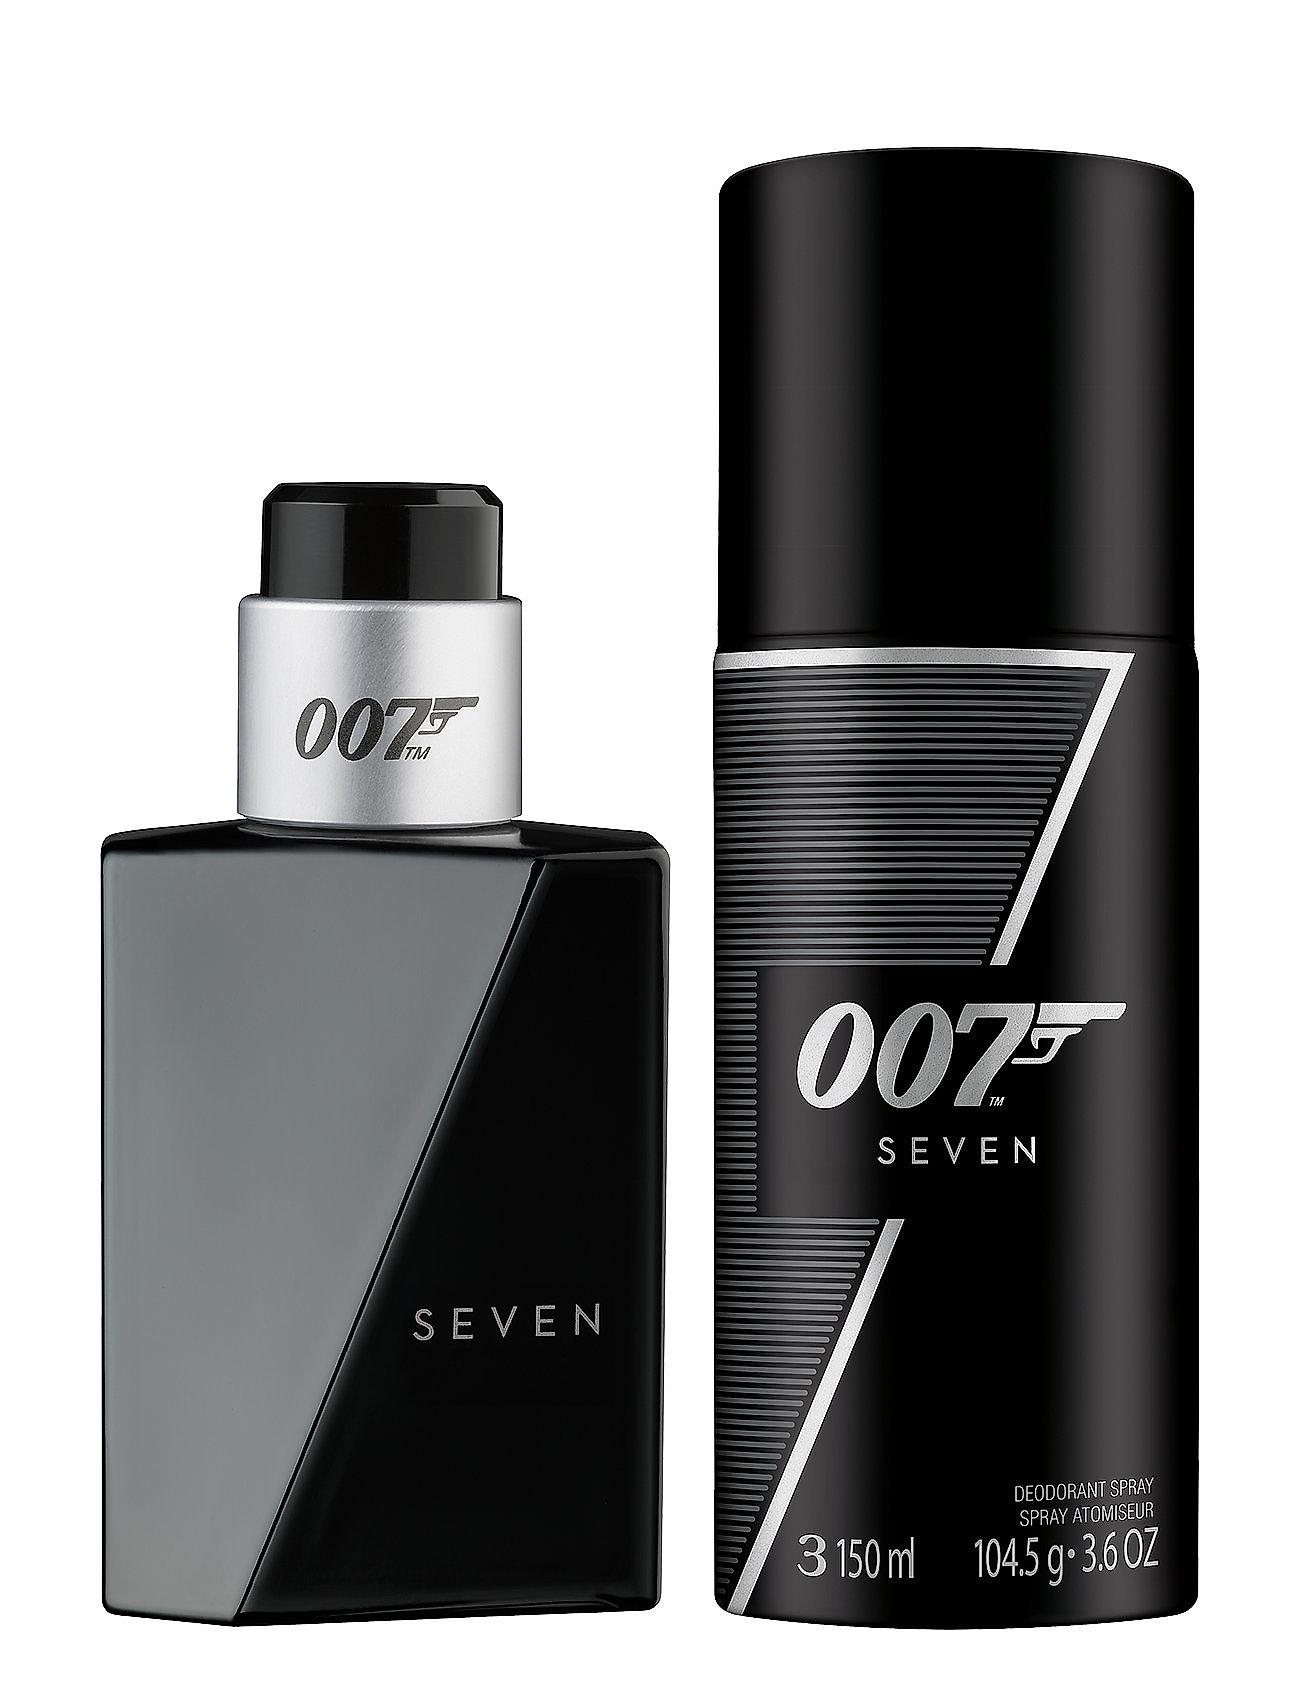 James Bond SEVEN EAU DE TOILETTE 30ML/DEODORANT SPRAY 150ML - NO COLOR